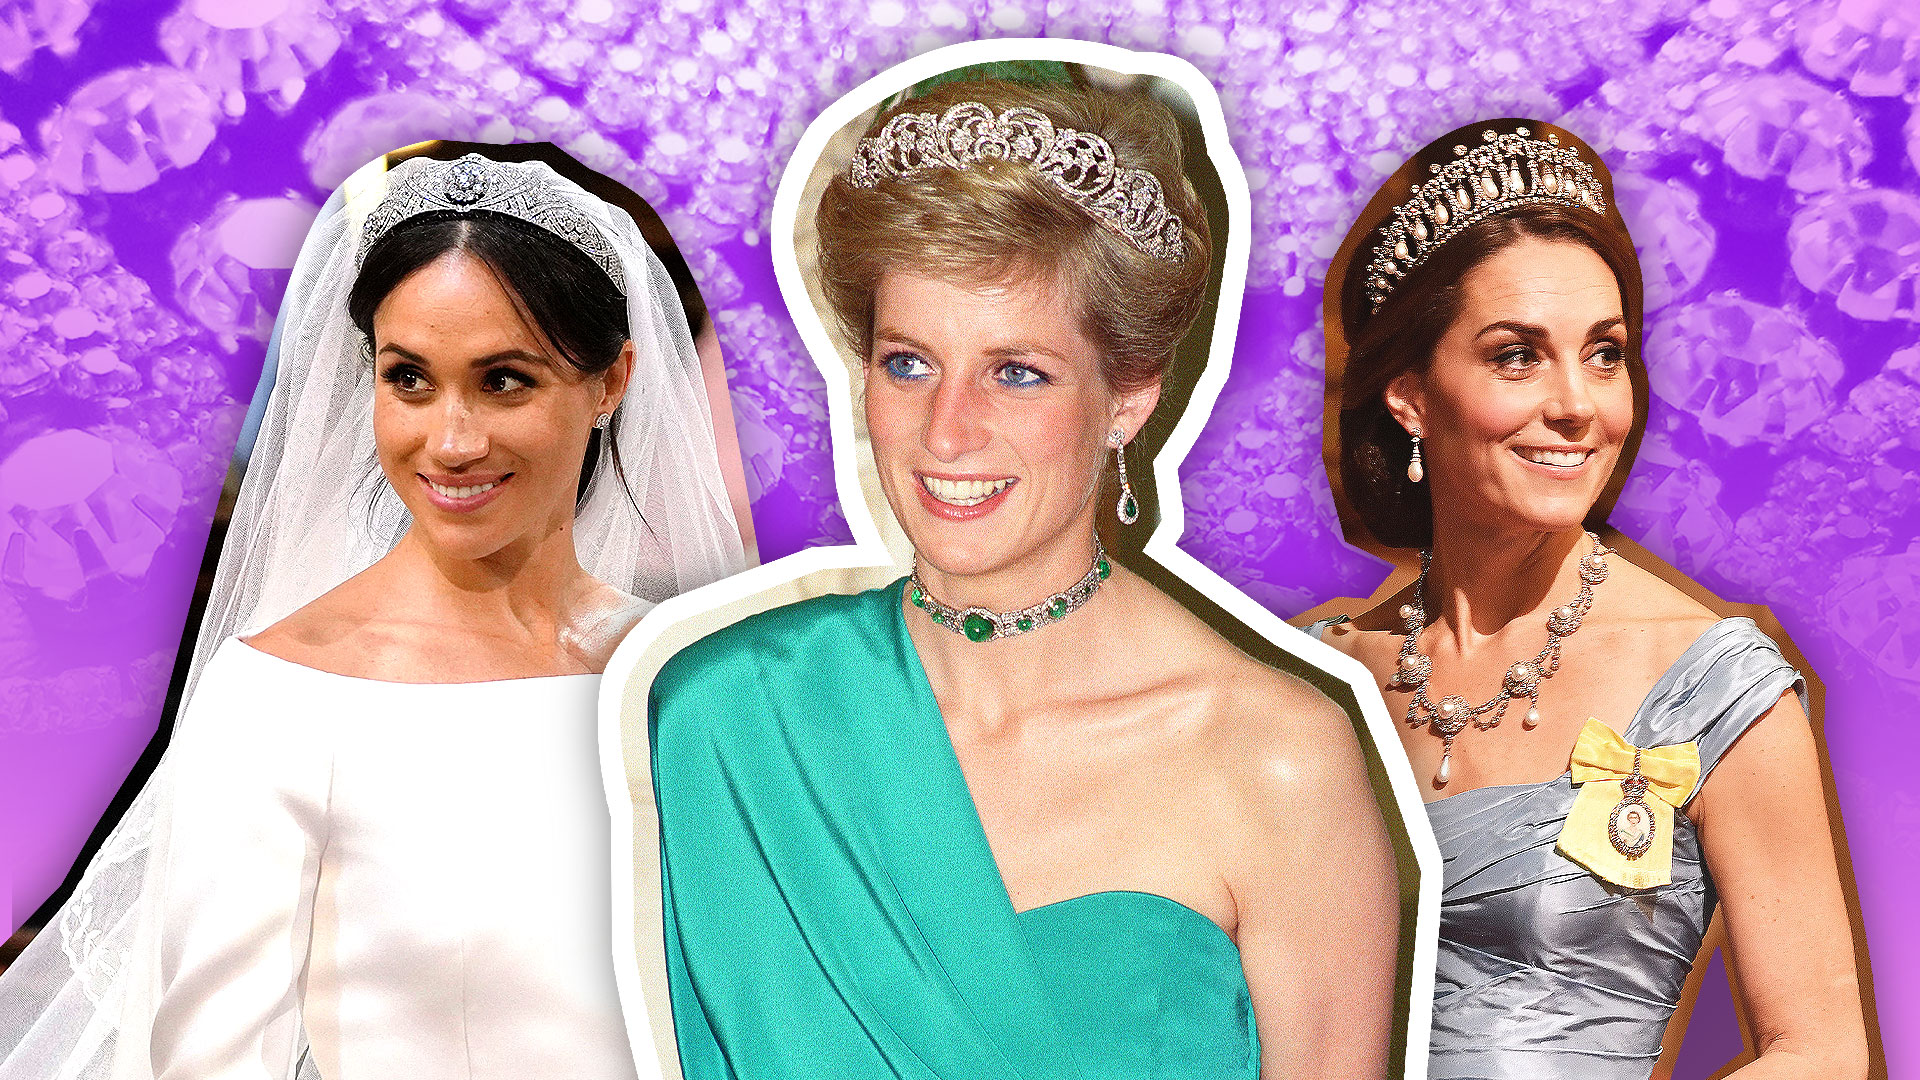 meghan markle kate middleton wearing princess diana s jewelry photos stylecaster meghan markle kate middleton wearing